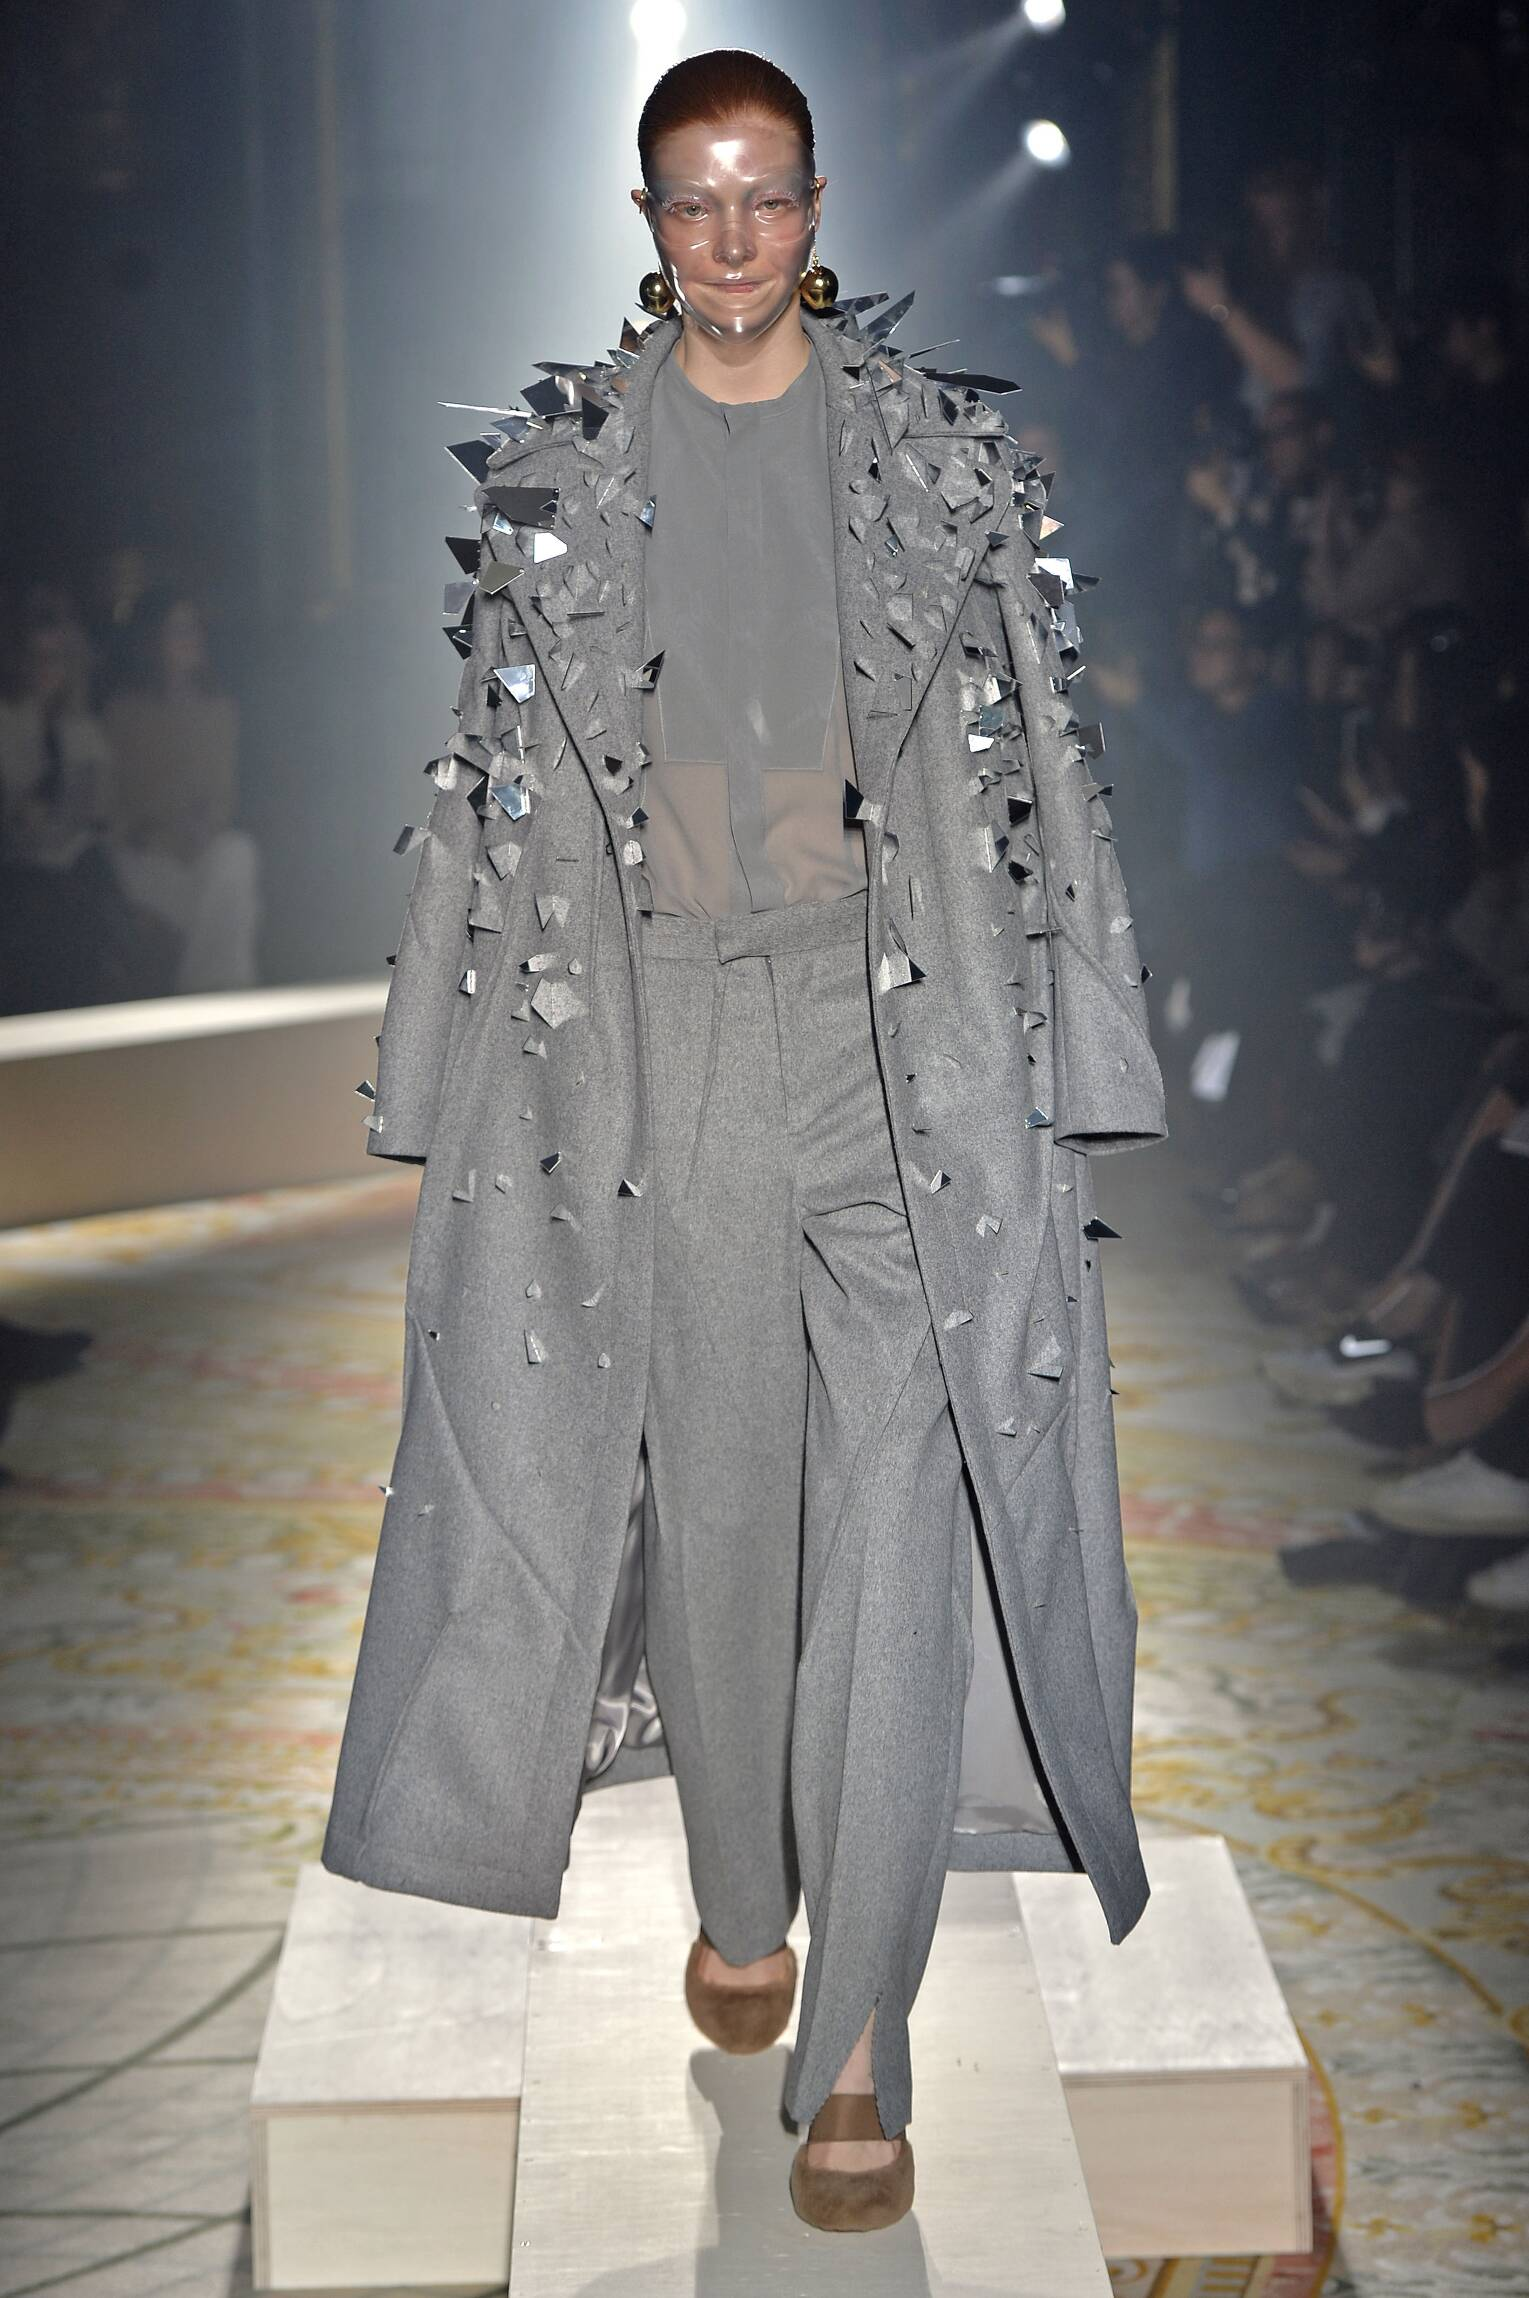 Fashion Show FW 2015 2016 Undercover Womenswear